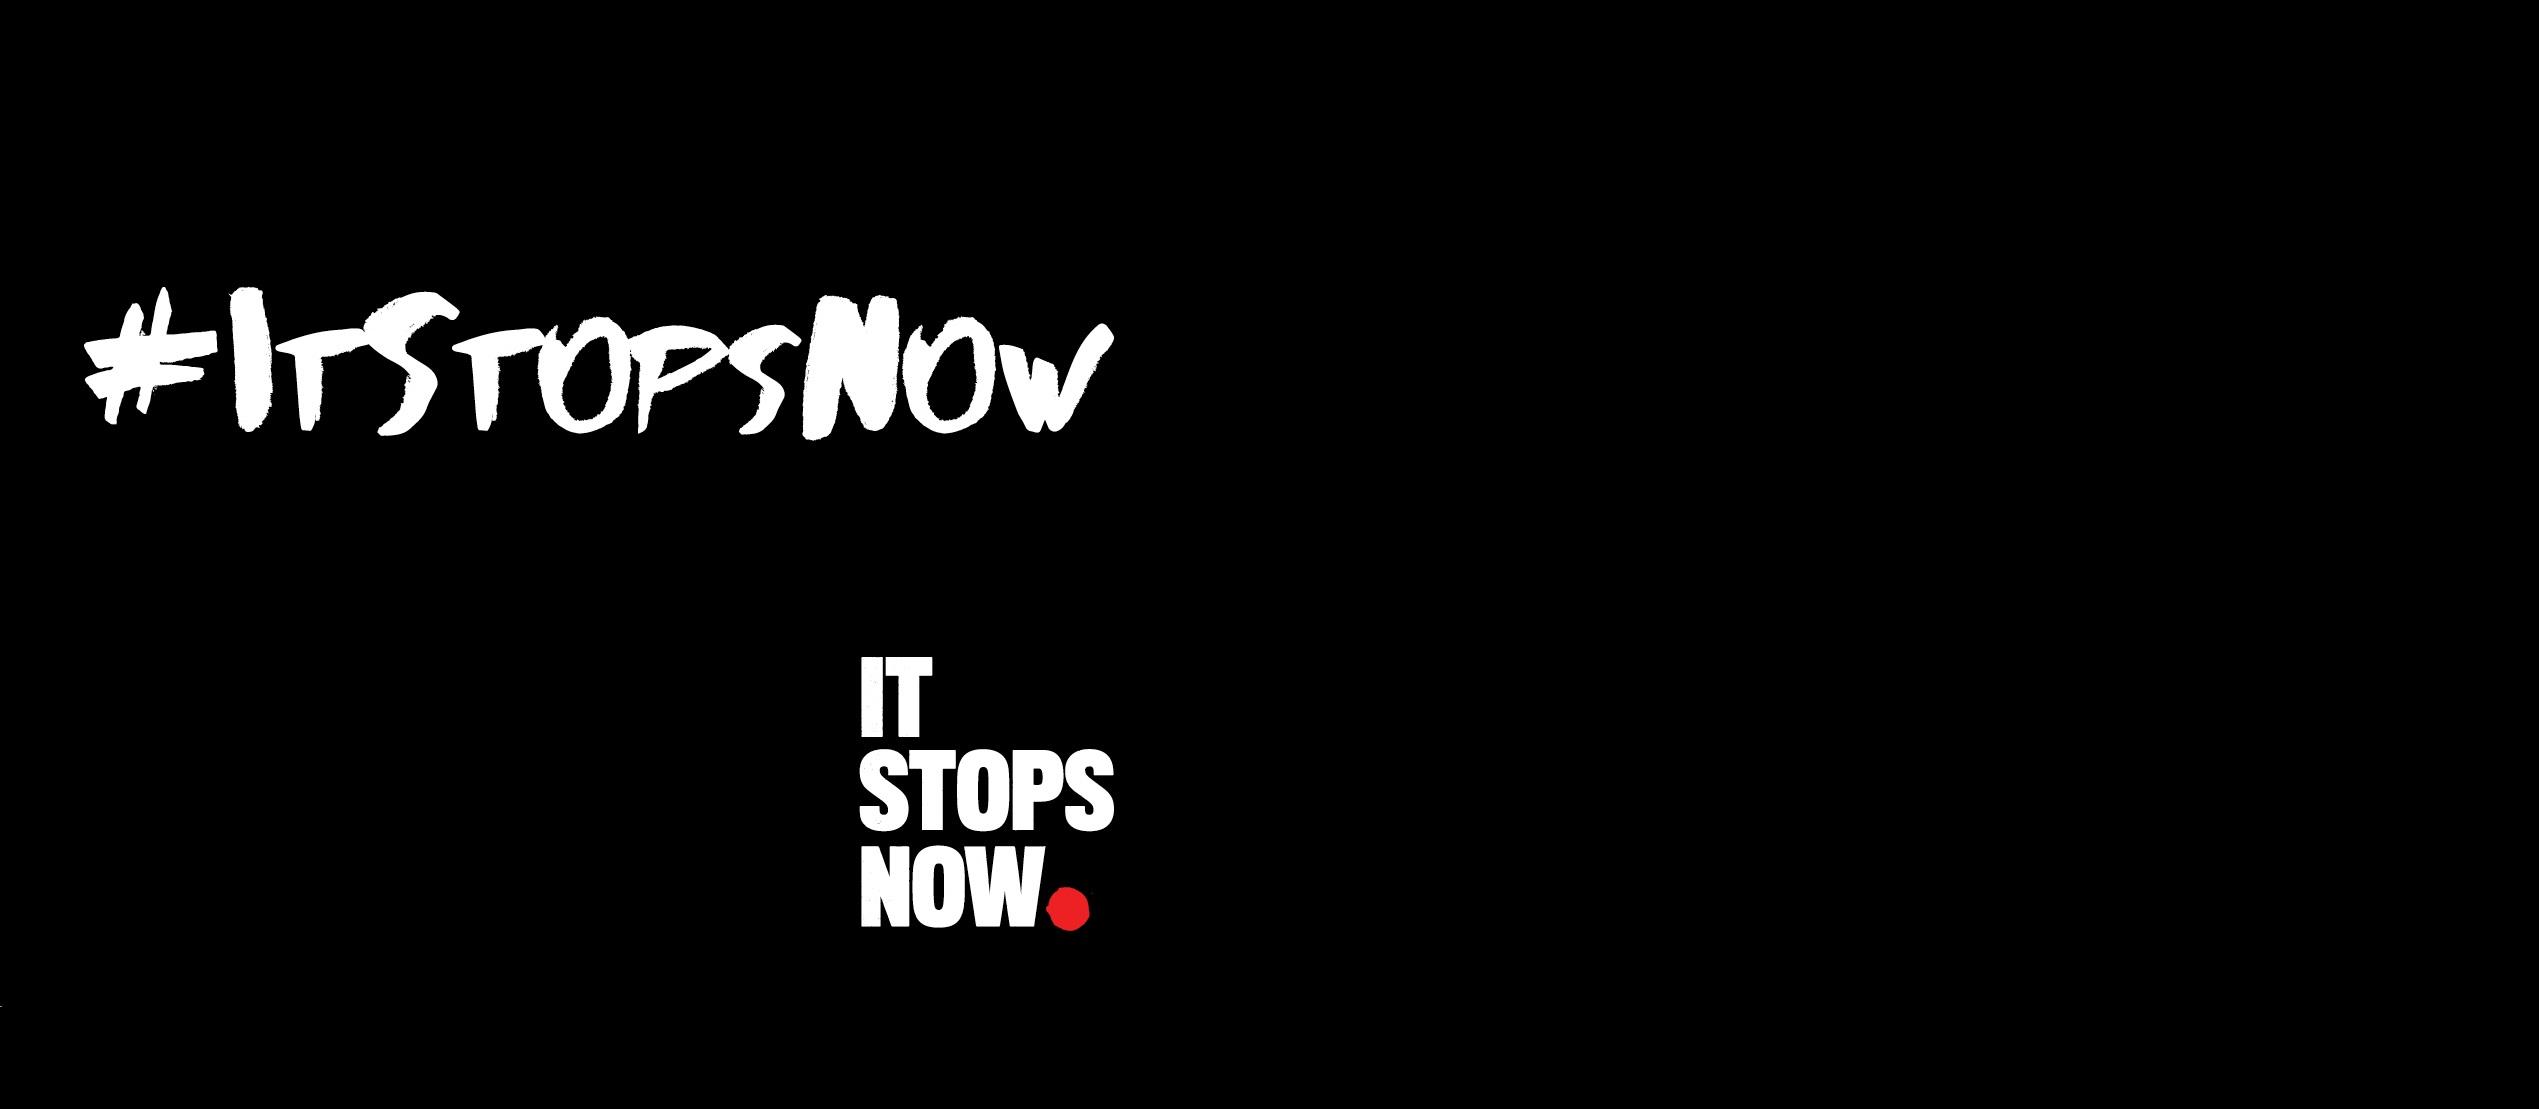 stops